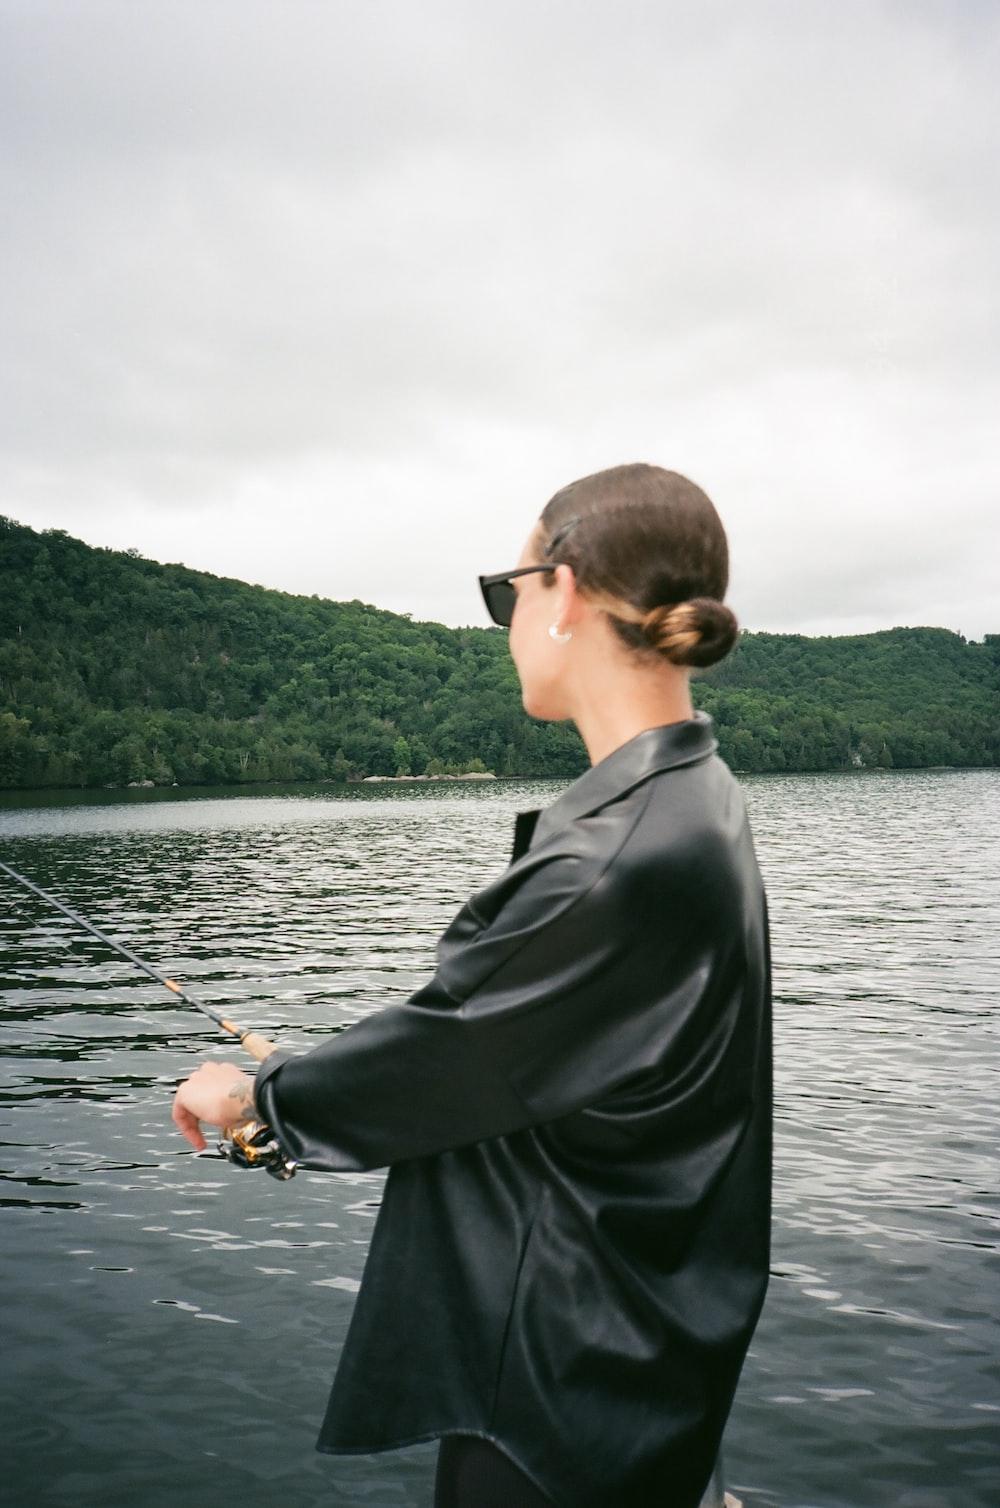 man in black suit jacket holding black fishing rod